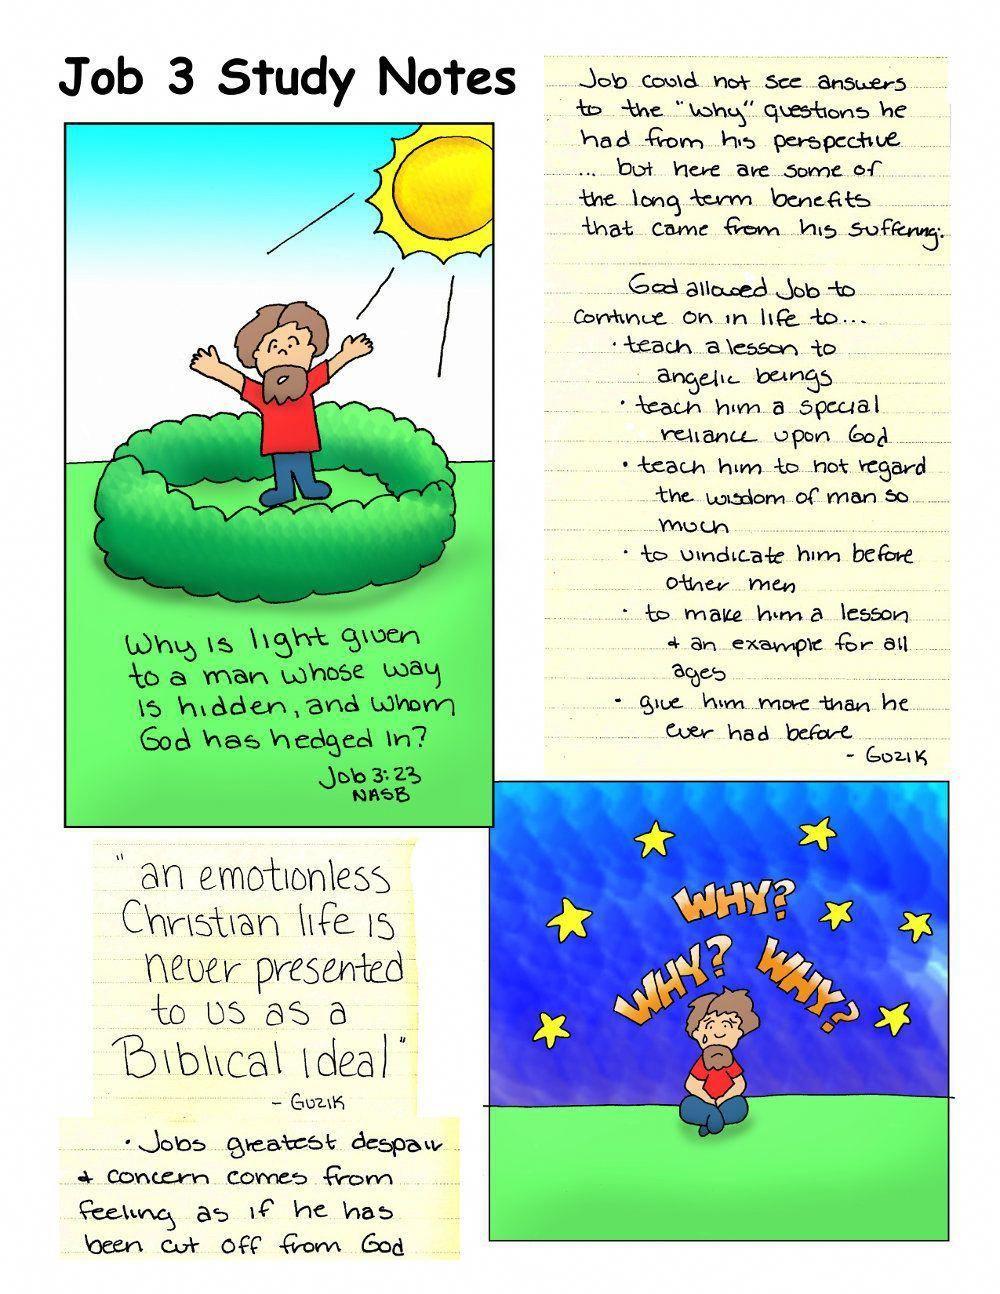 Have You Considered My Servant Job? Bible study job, Job